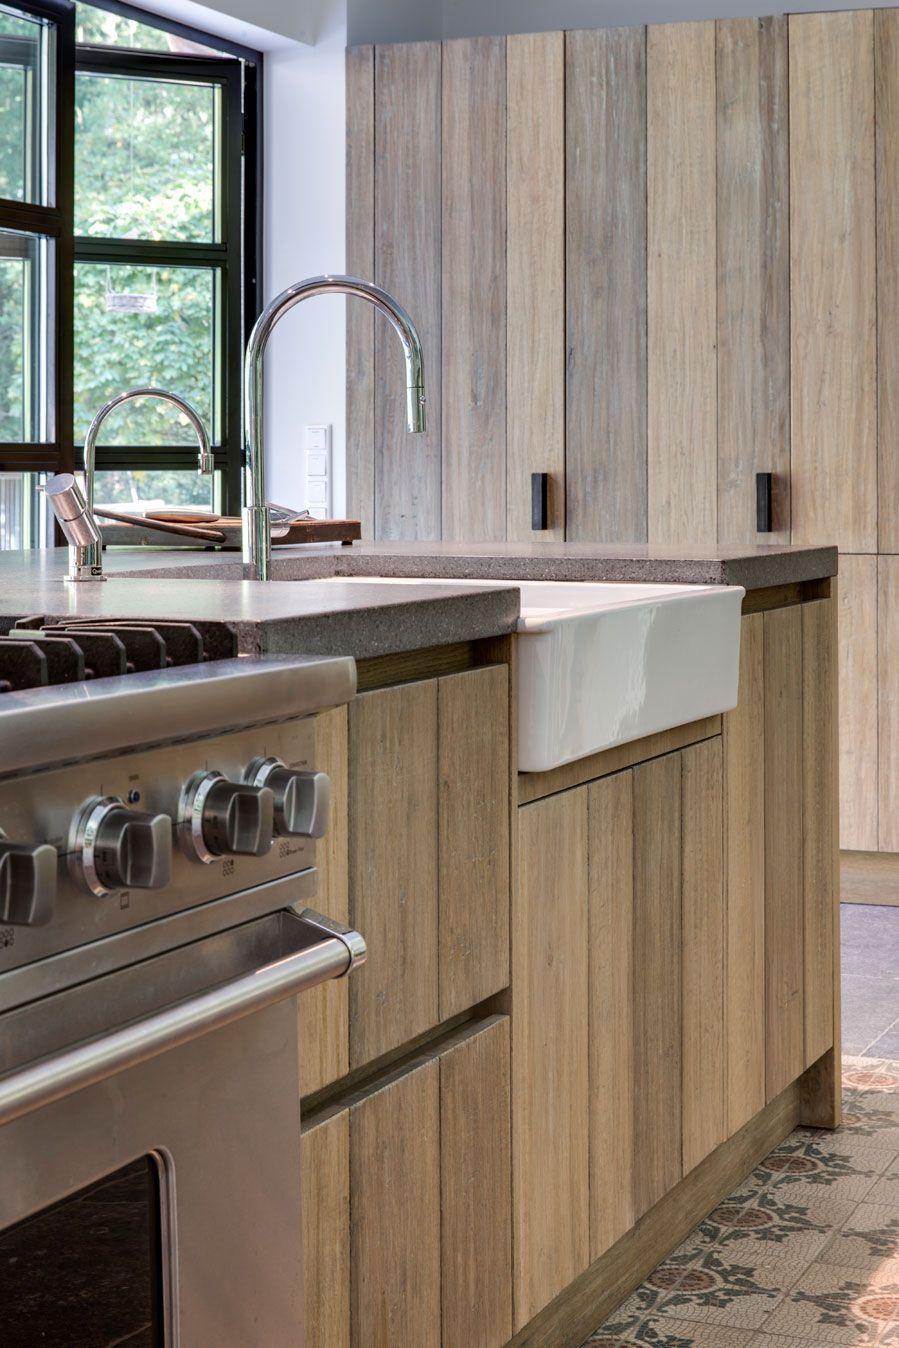 22 Nieuw Kruidenrek Keuken Con Imagenes Cocinas Integradas